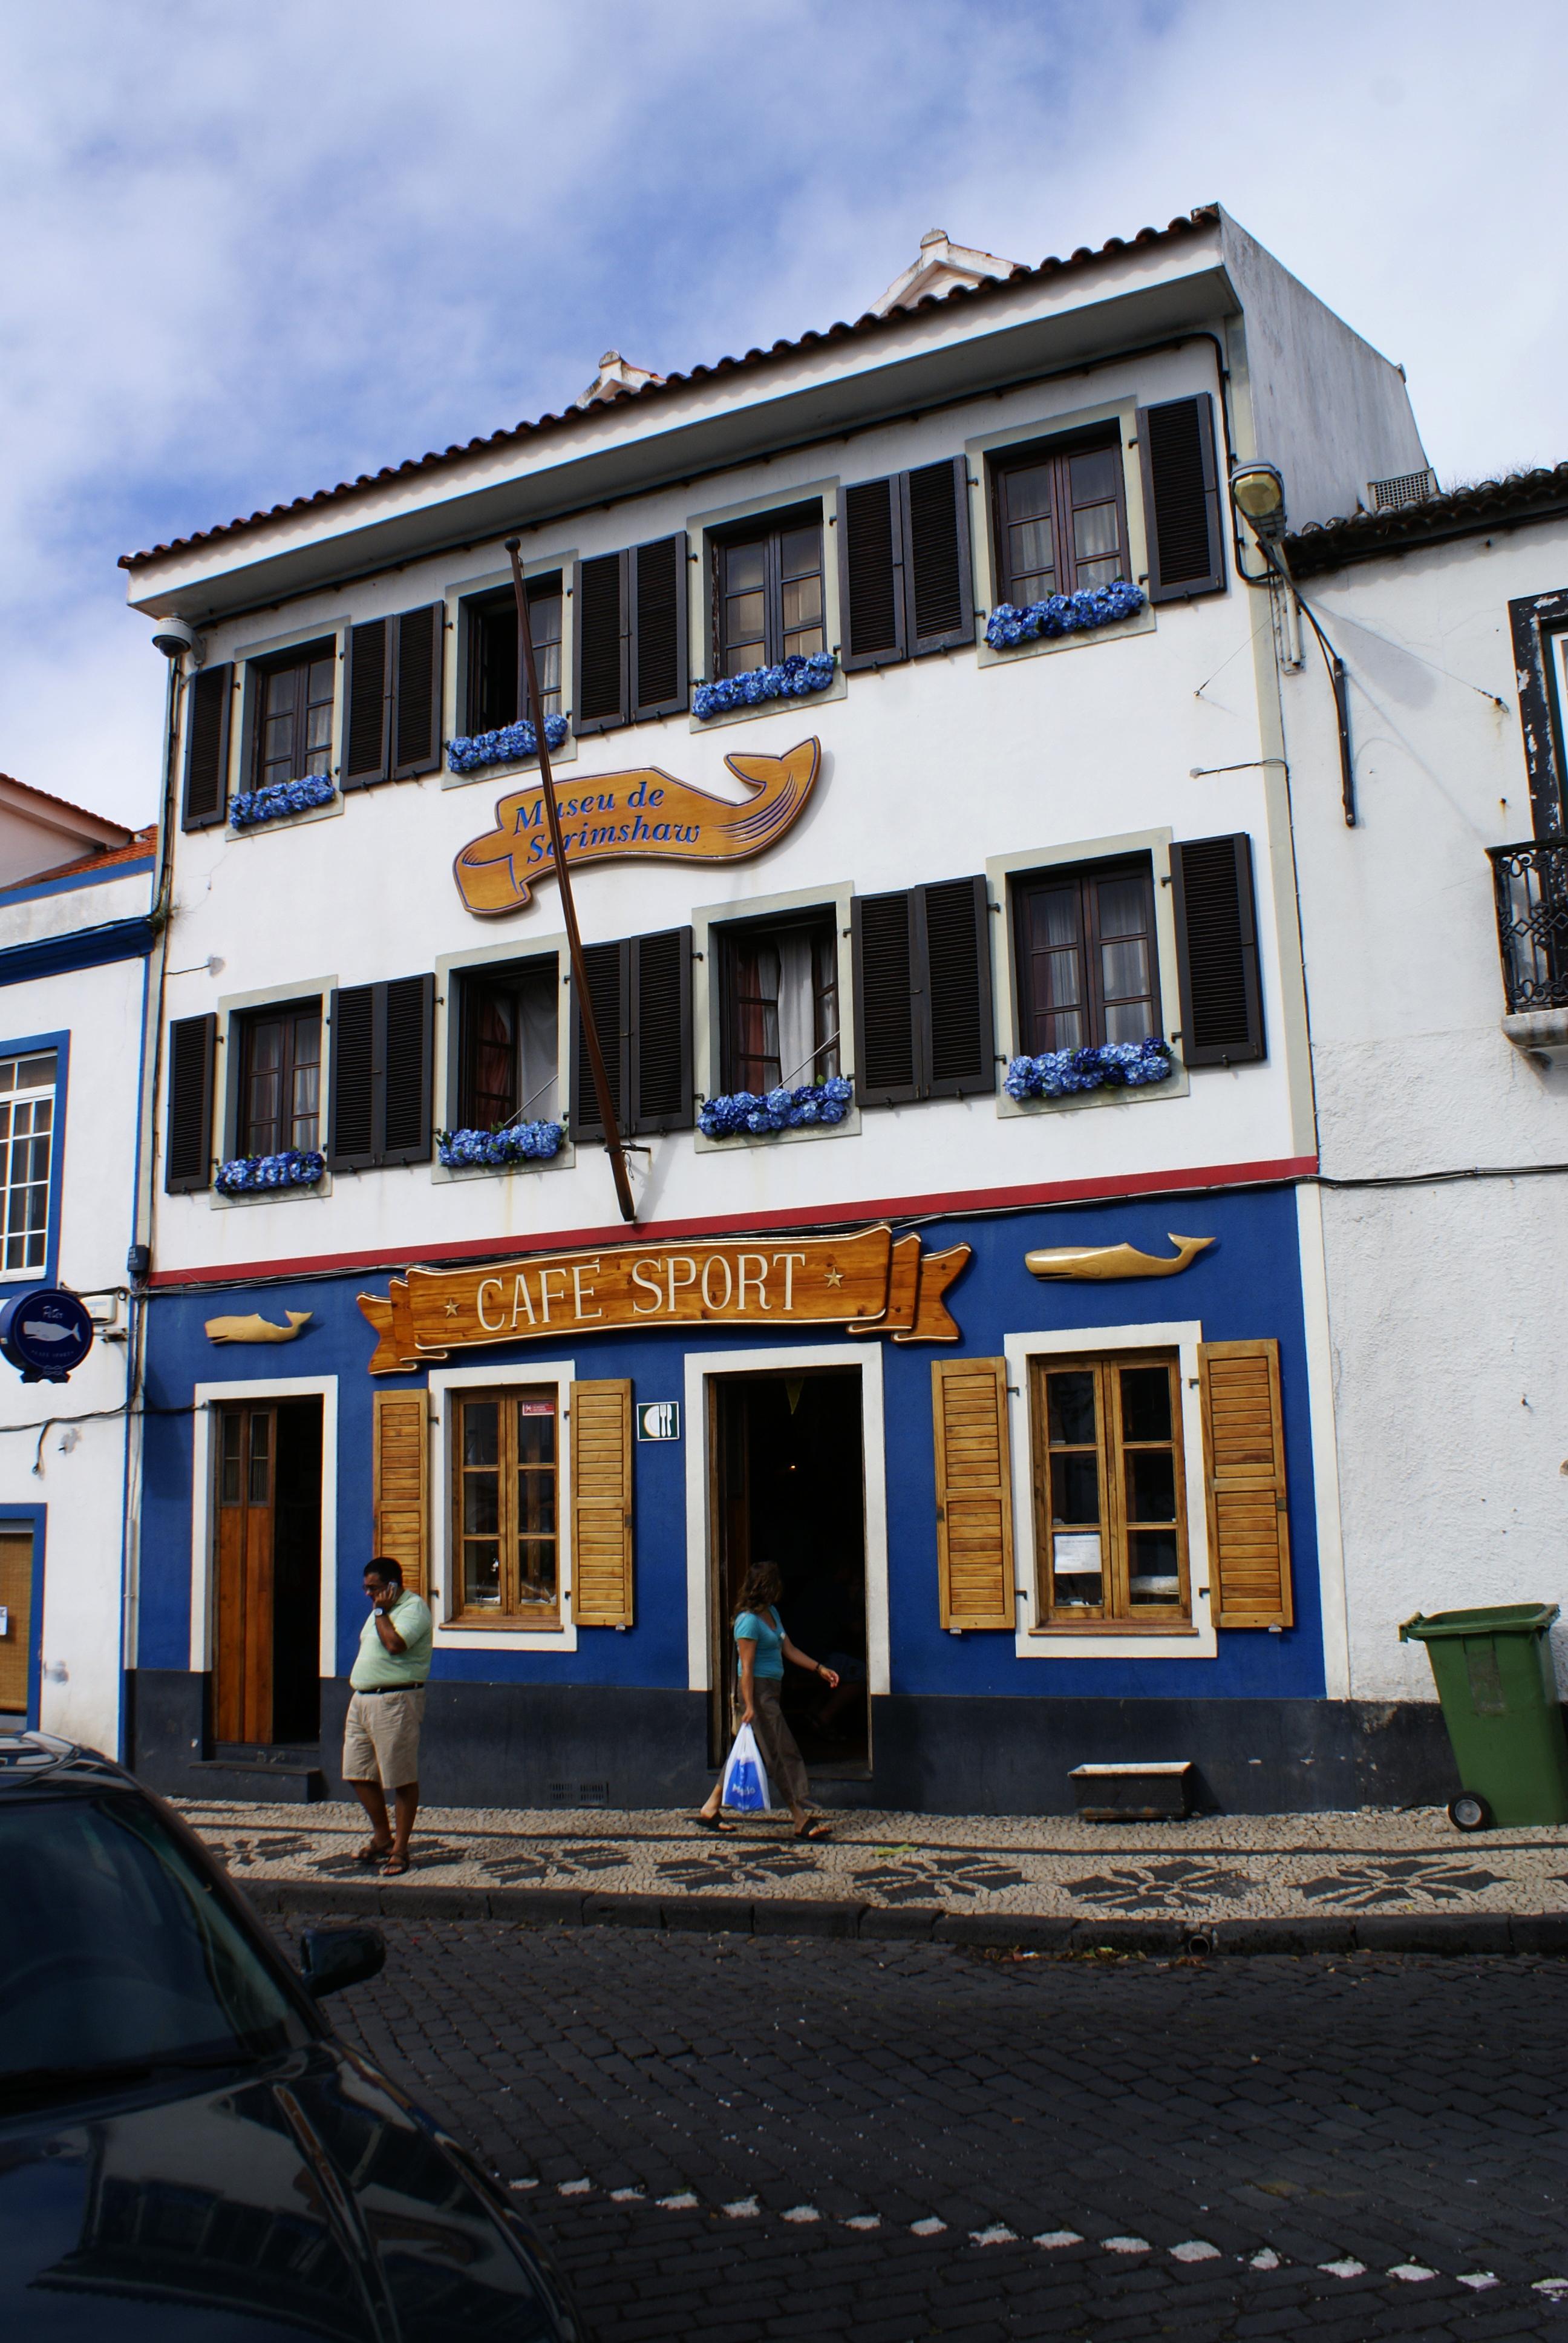 Peter S Cafe  El Camino Real Millbrae Ca  Usa